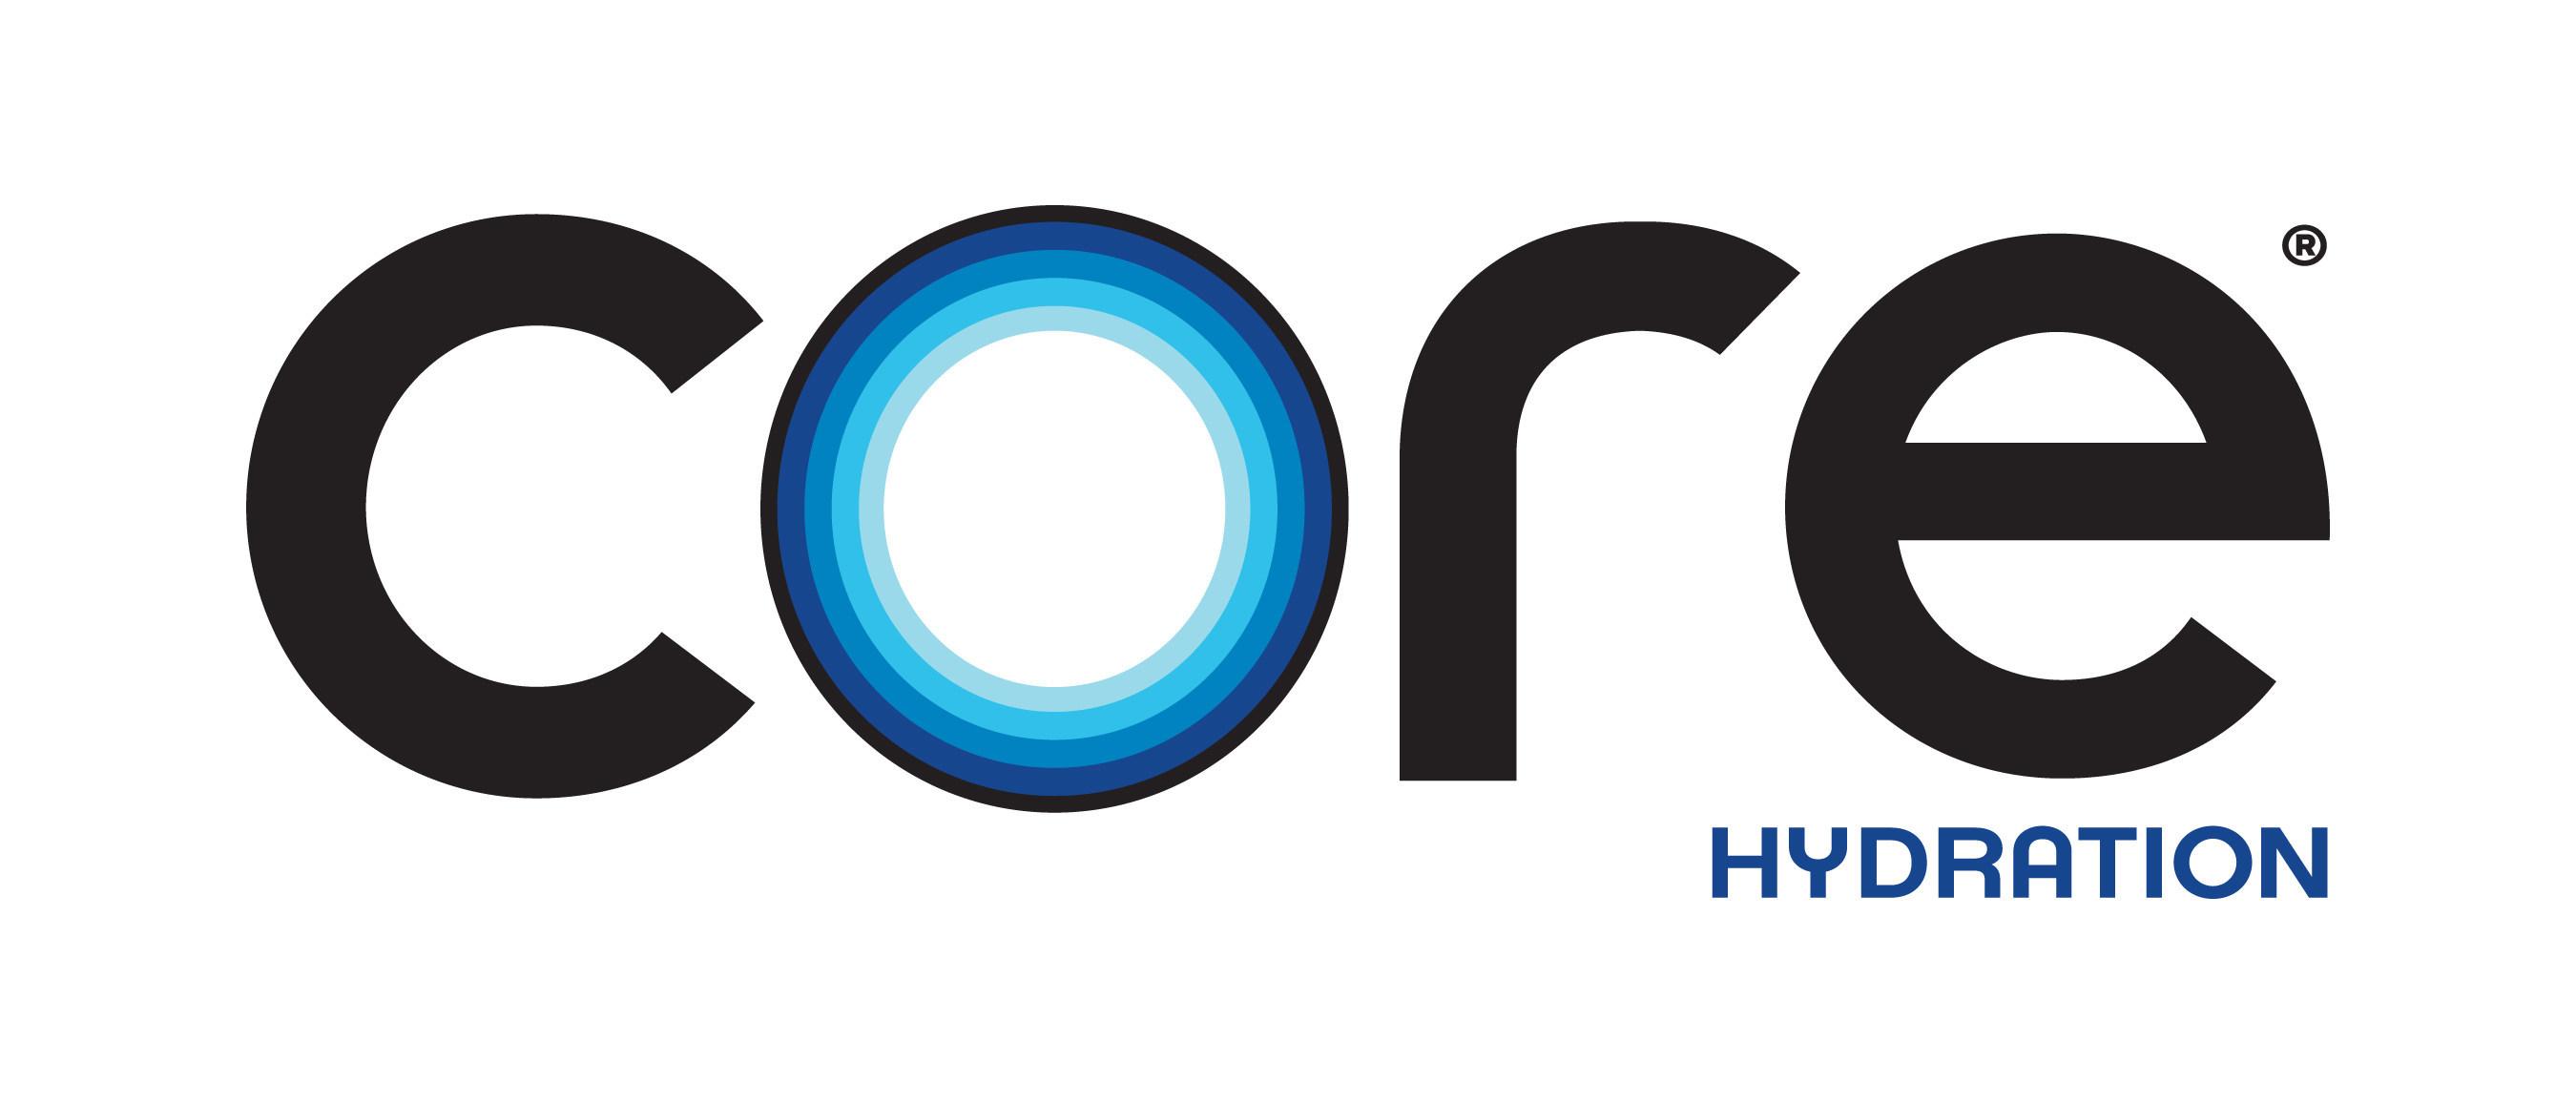 CORE Hydration (PRNewsfoto/CORE Nutrition, LLC)